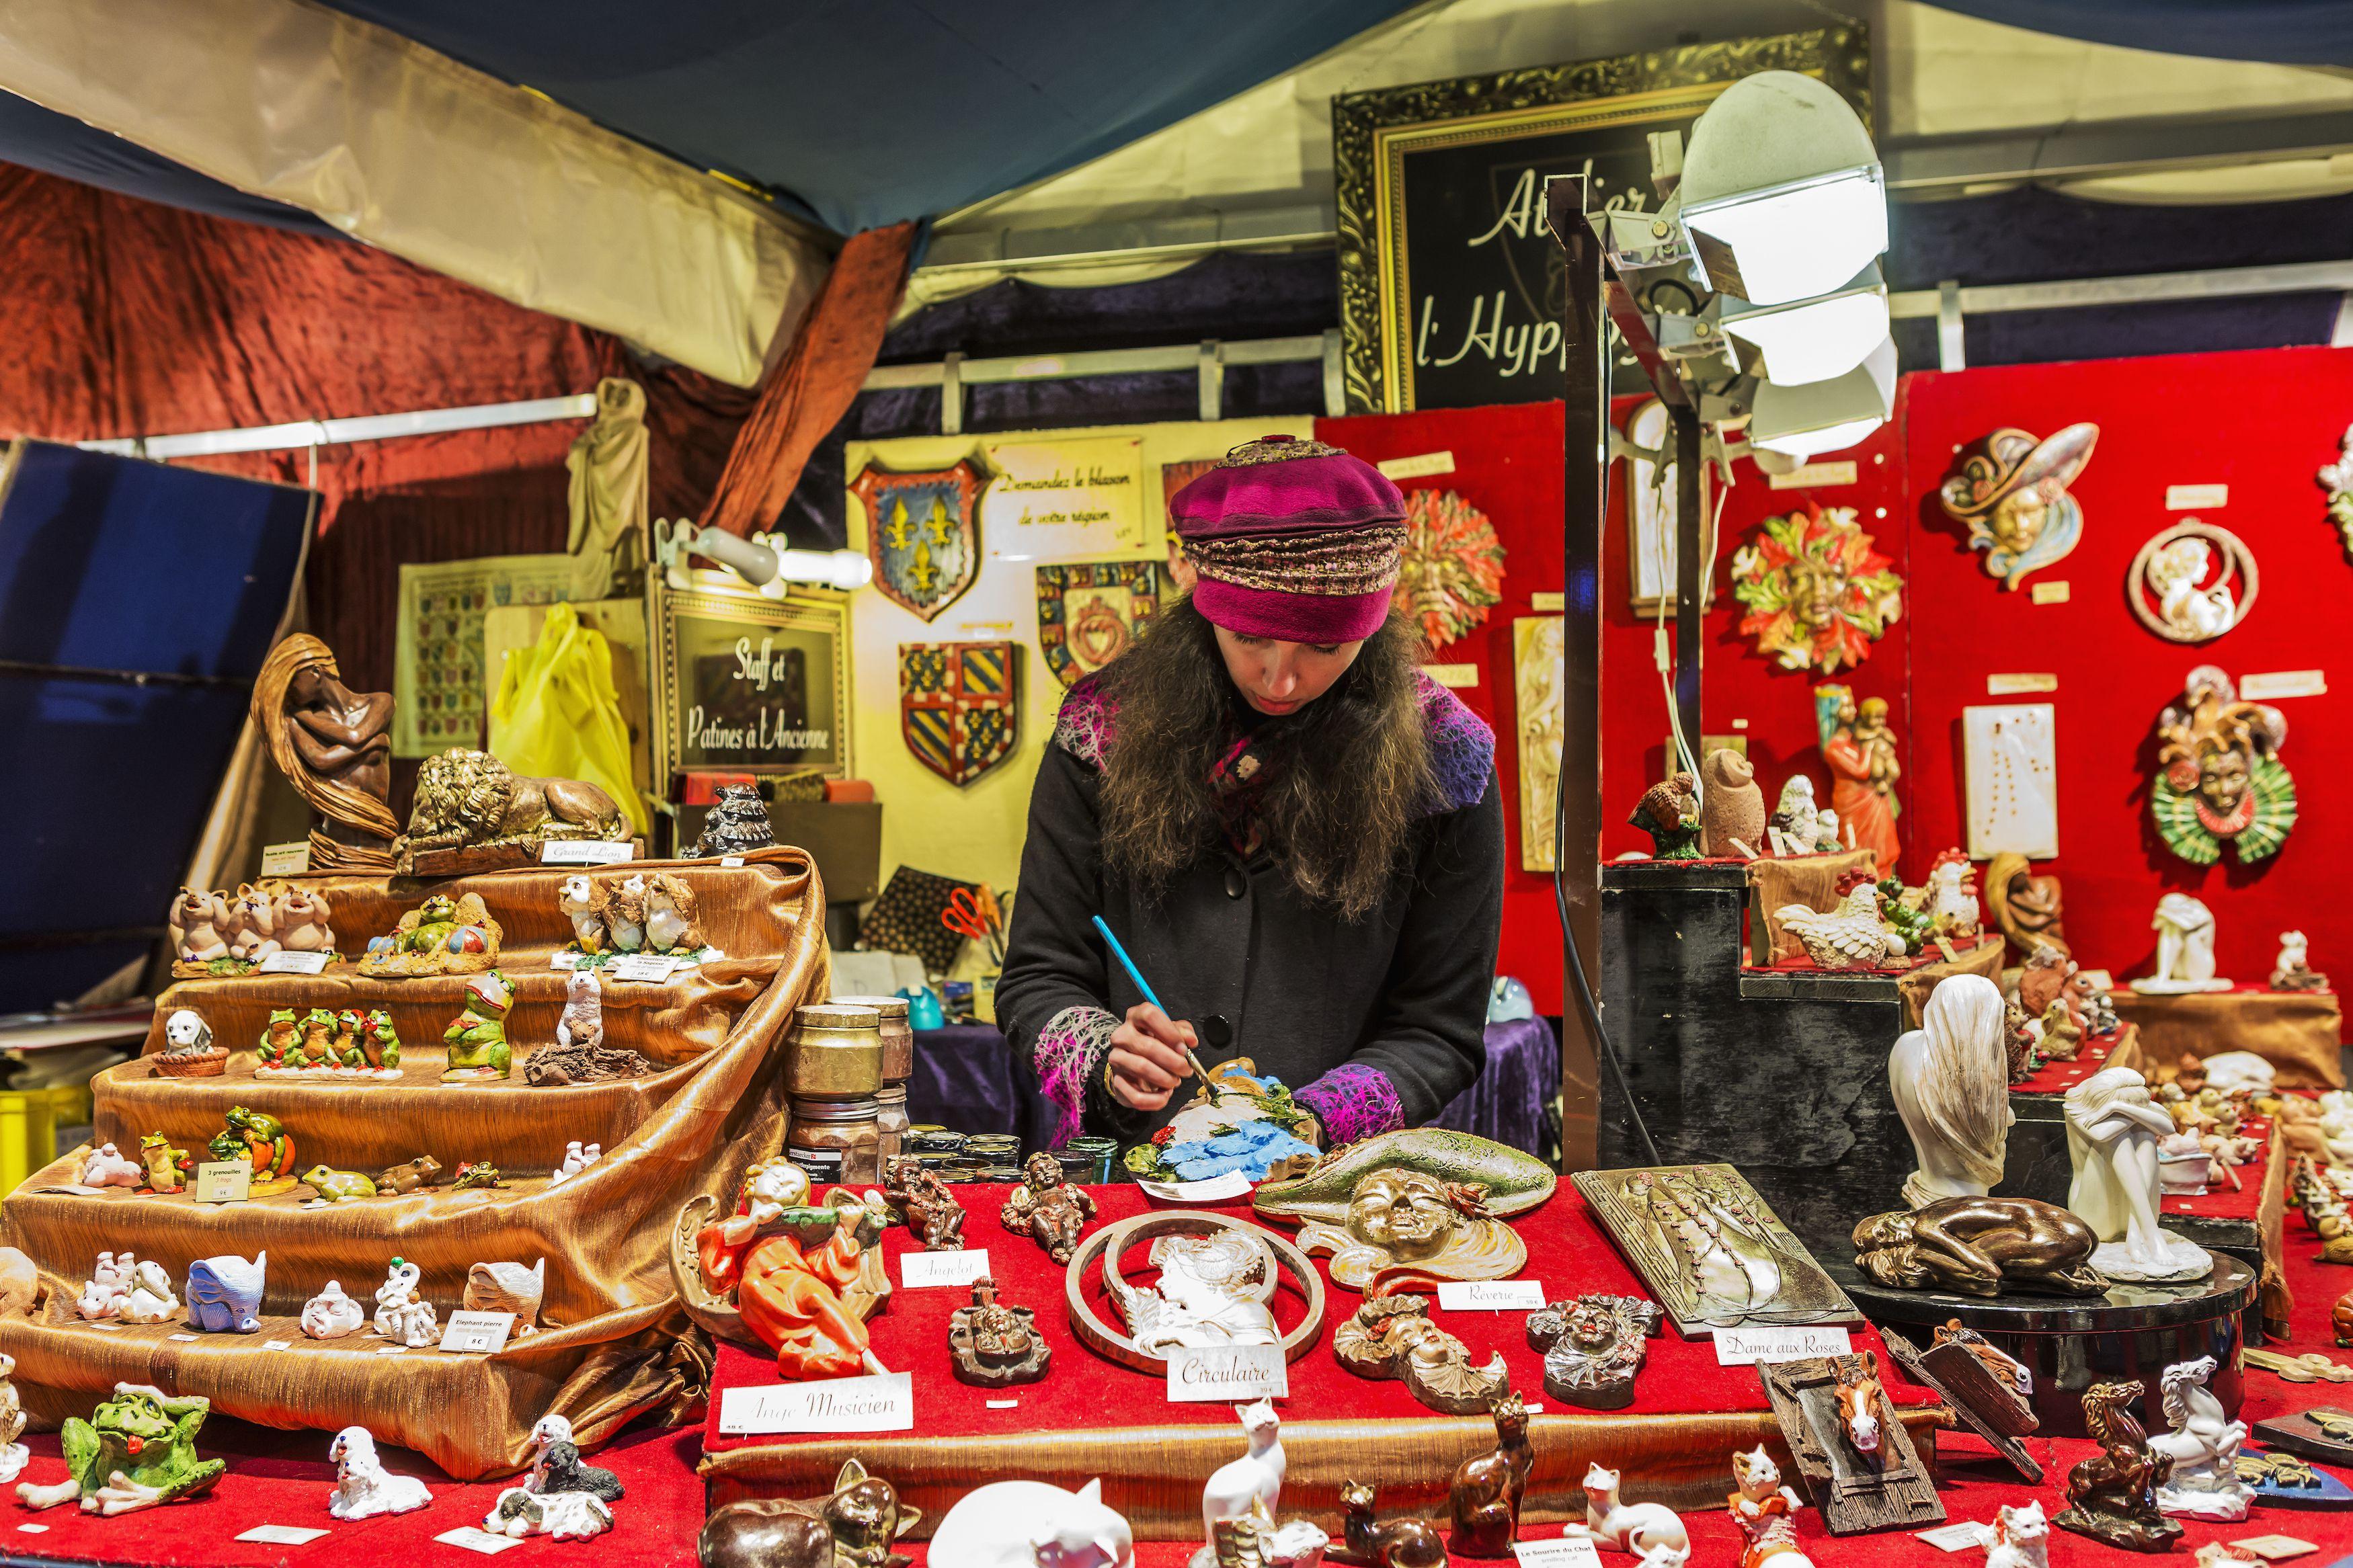 Paris Weihnachtsmarkt.The Best Paris Christmas Markets For 2019 And 2020